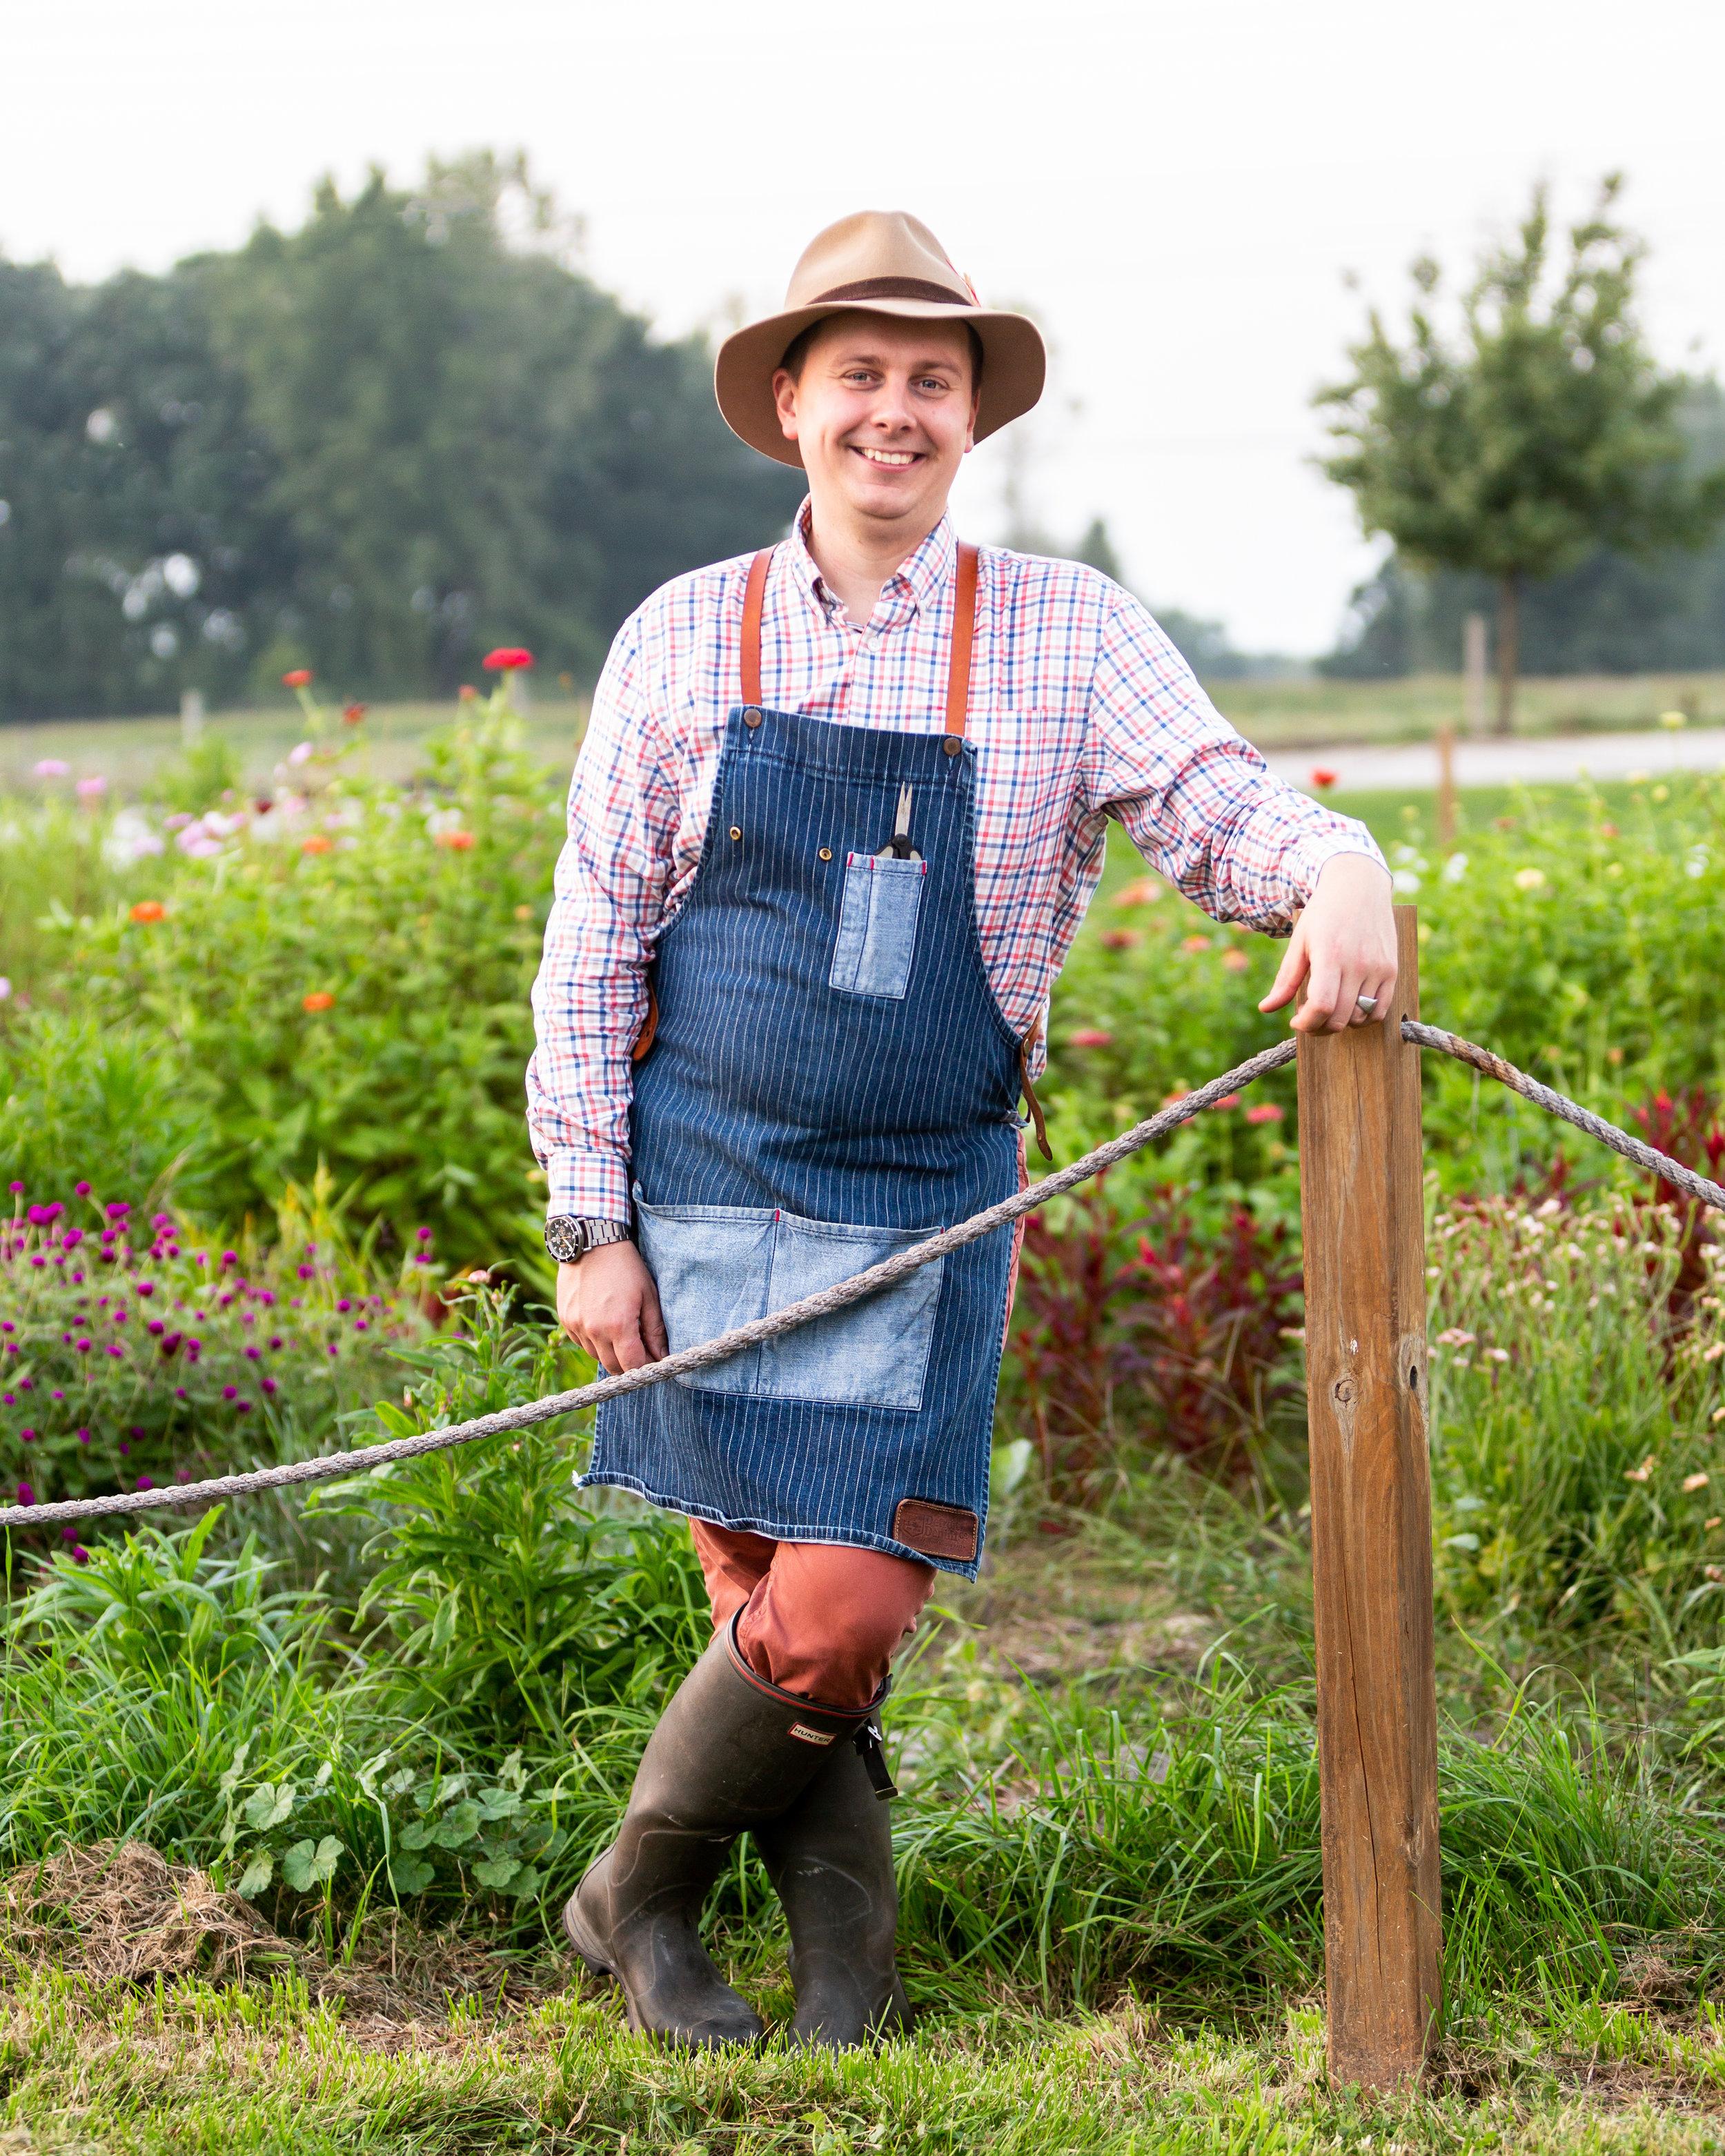 Kieron Hales - Managing Partner at Zingerman's Cornman Farms